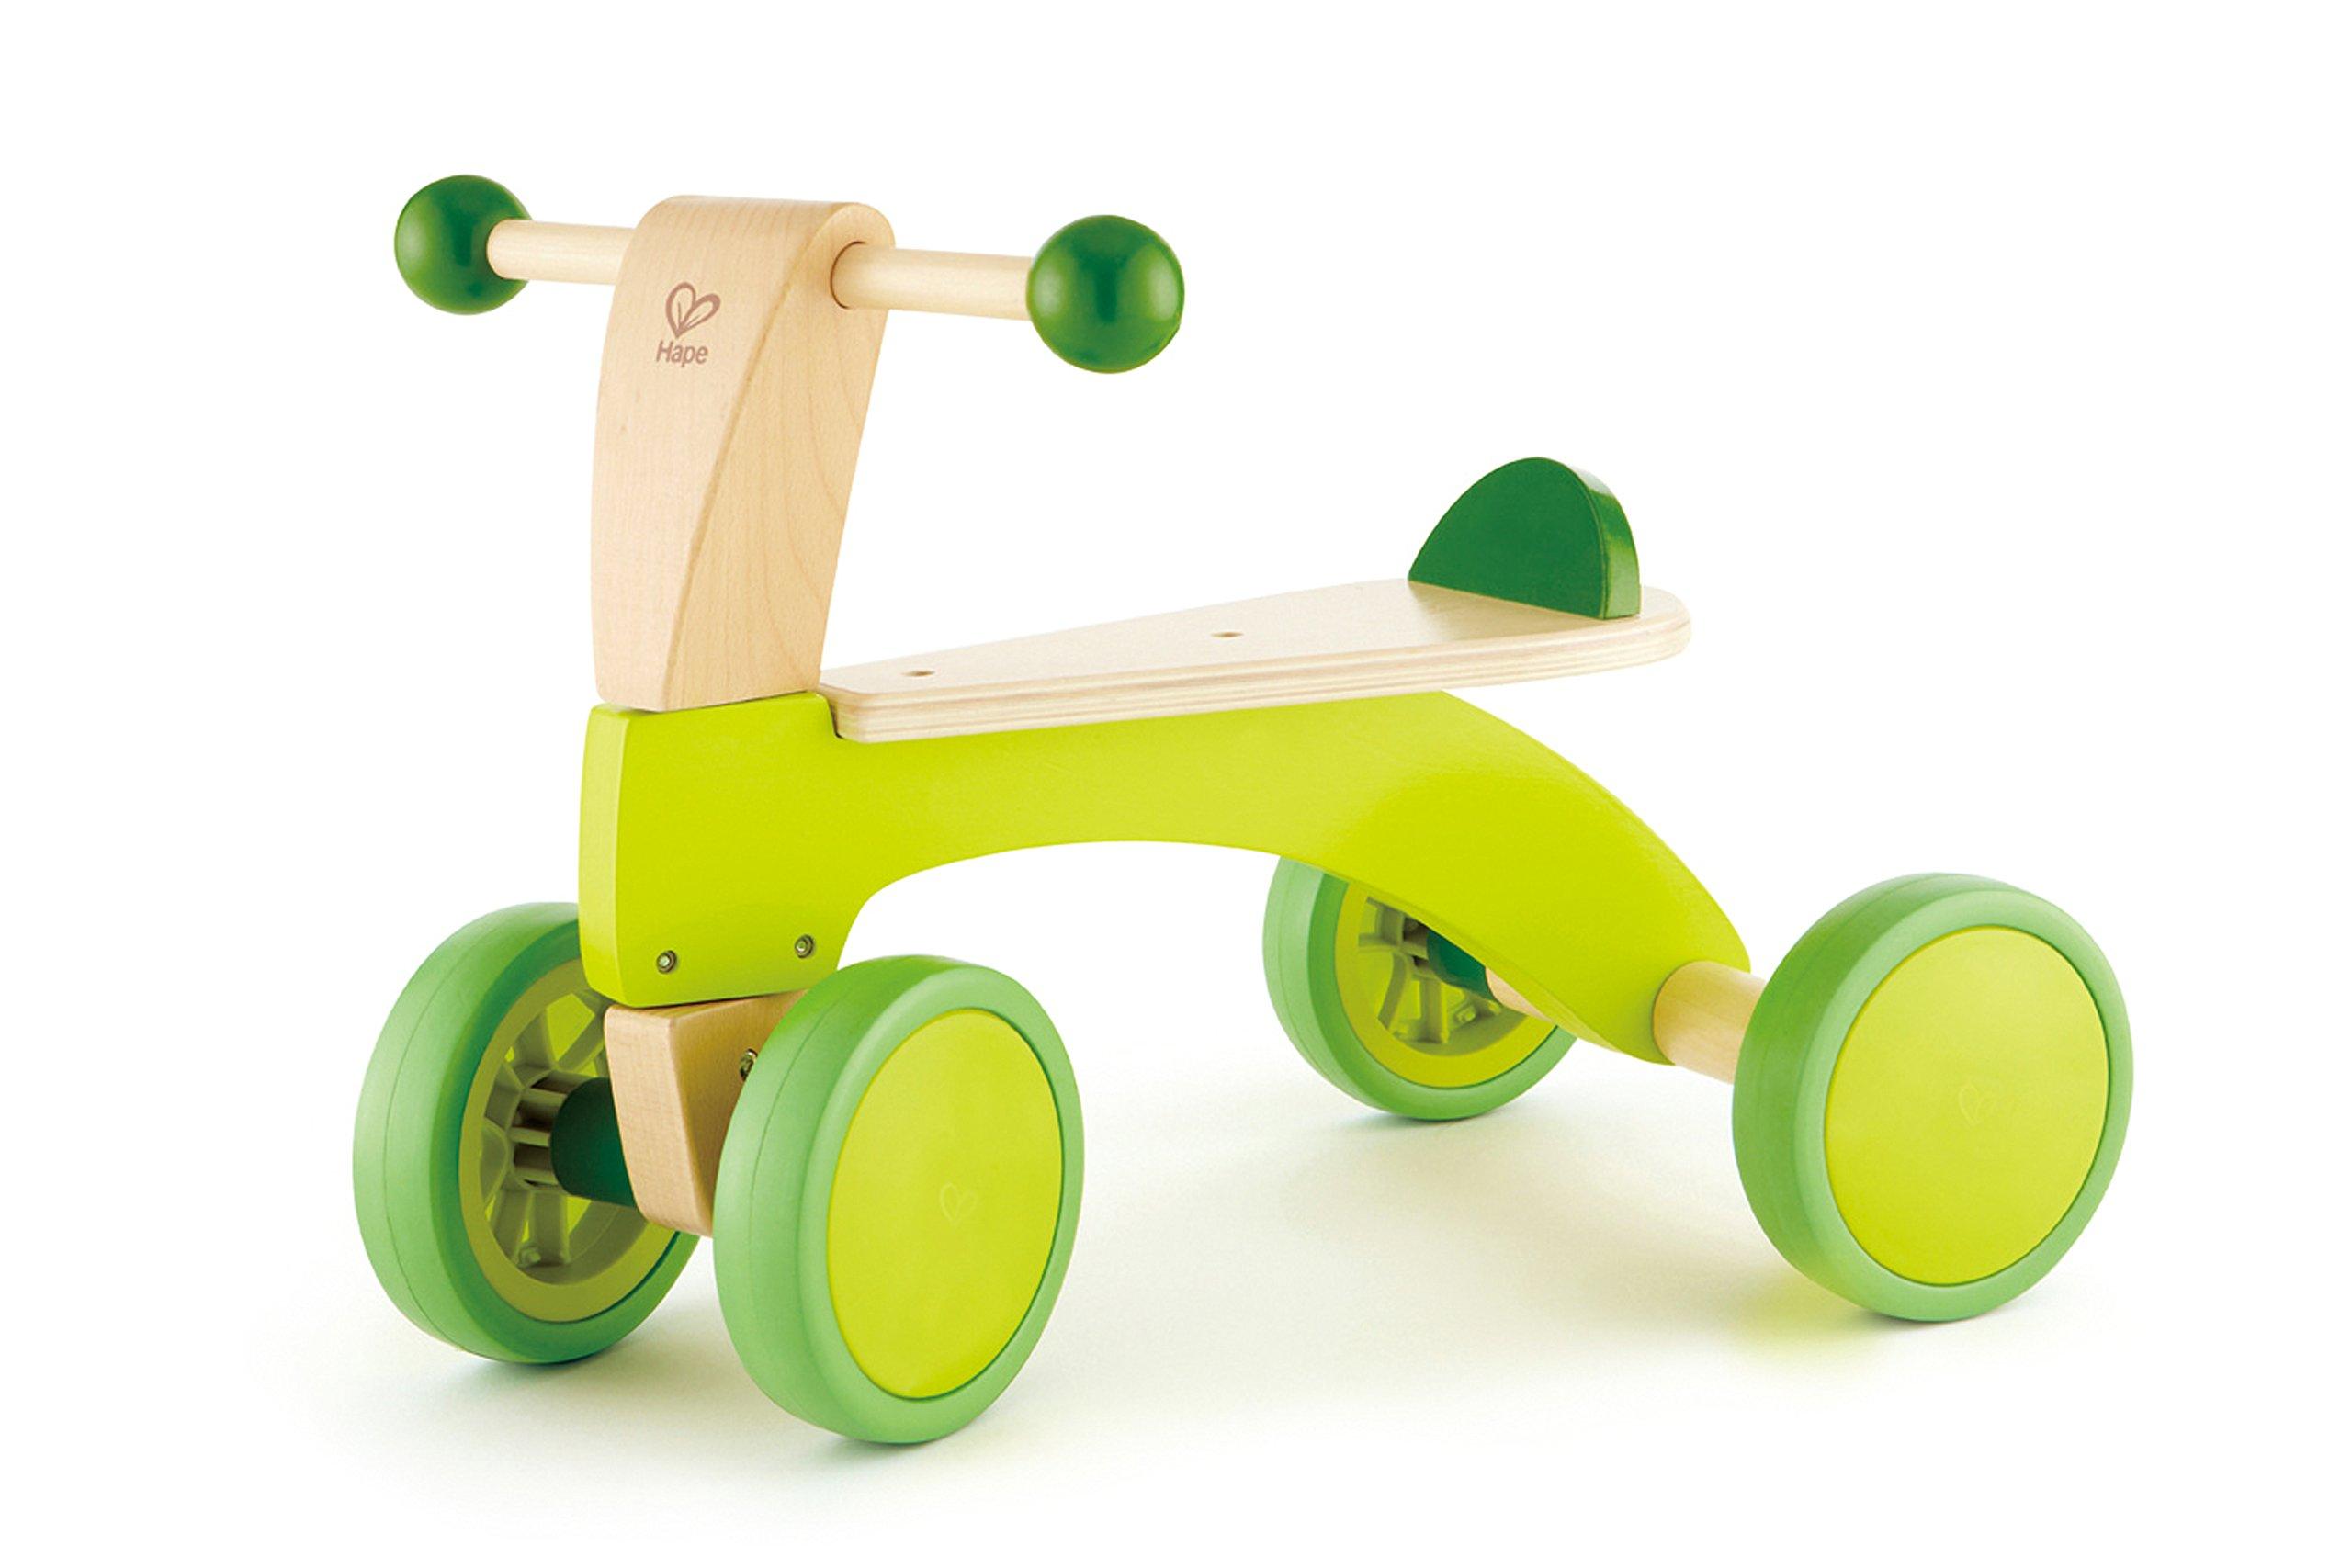 Hape Award Winning Scoot Around Kid's Wooden Ride On by Hape